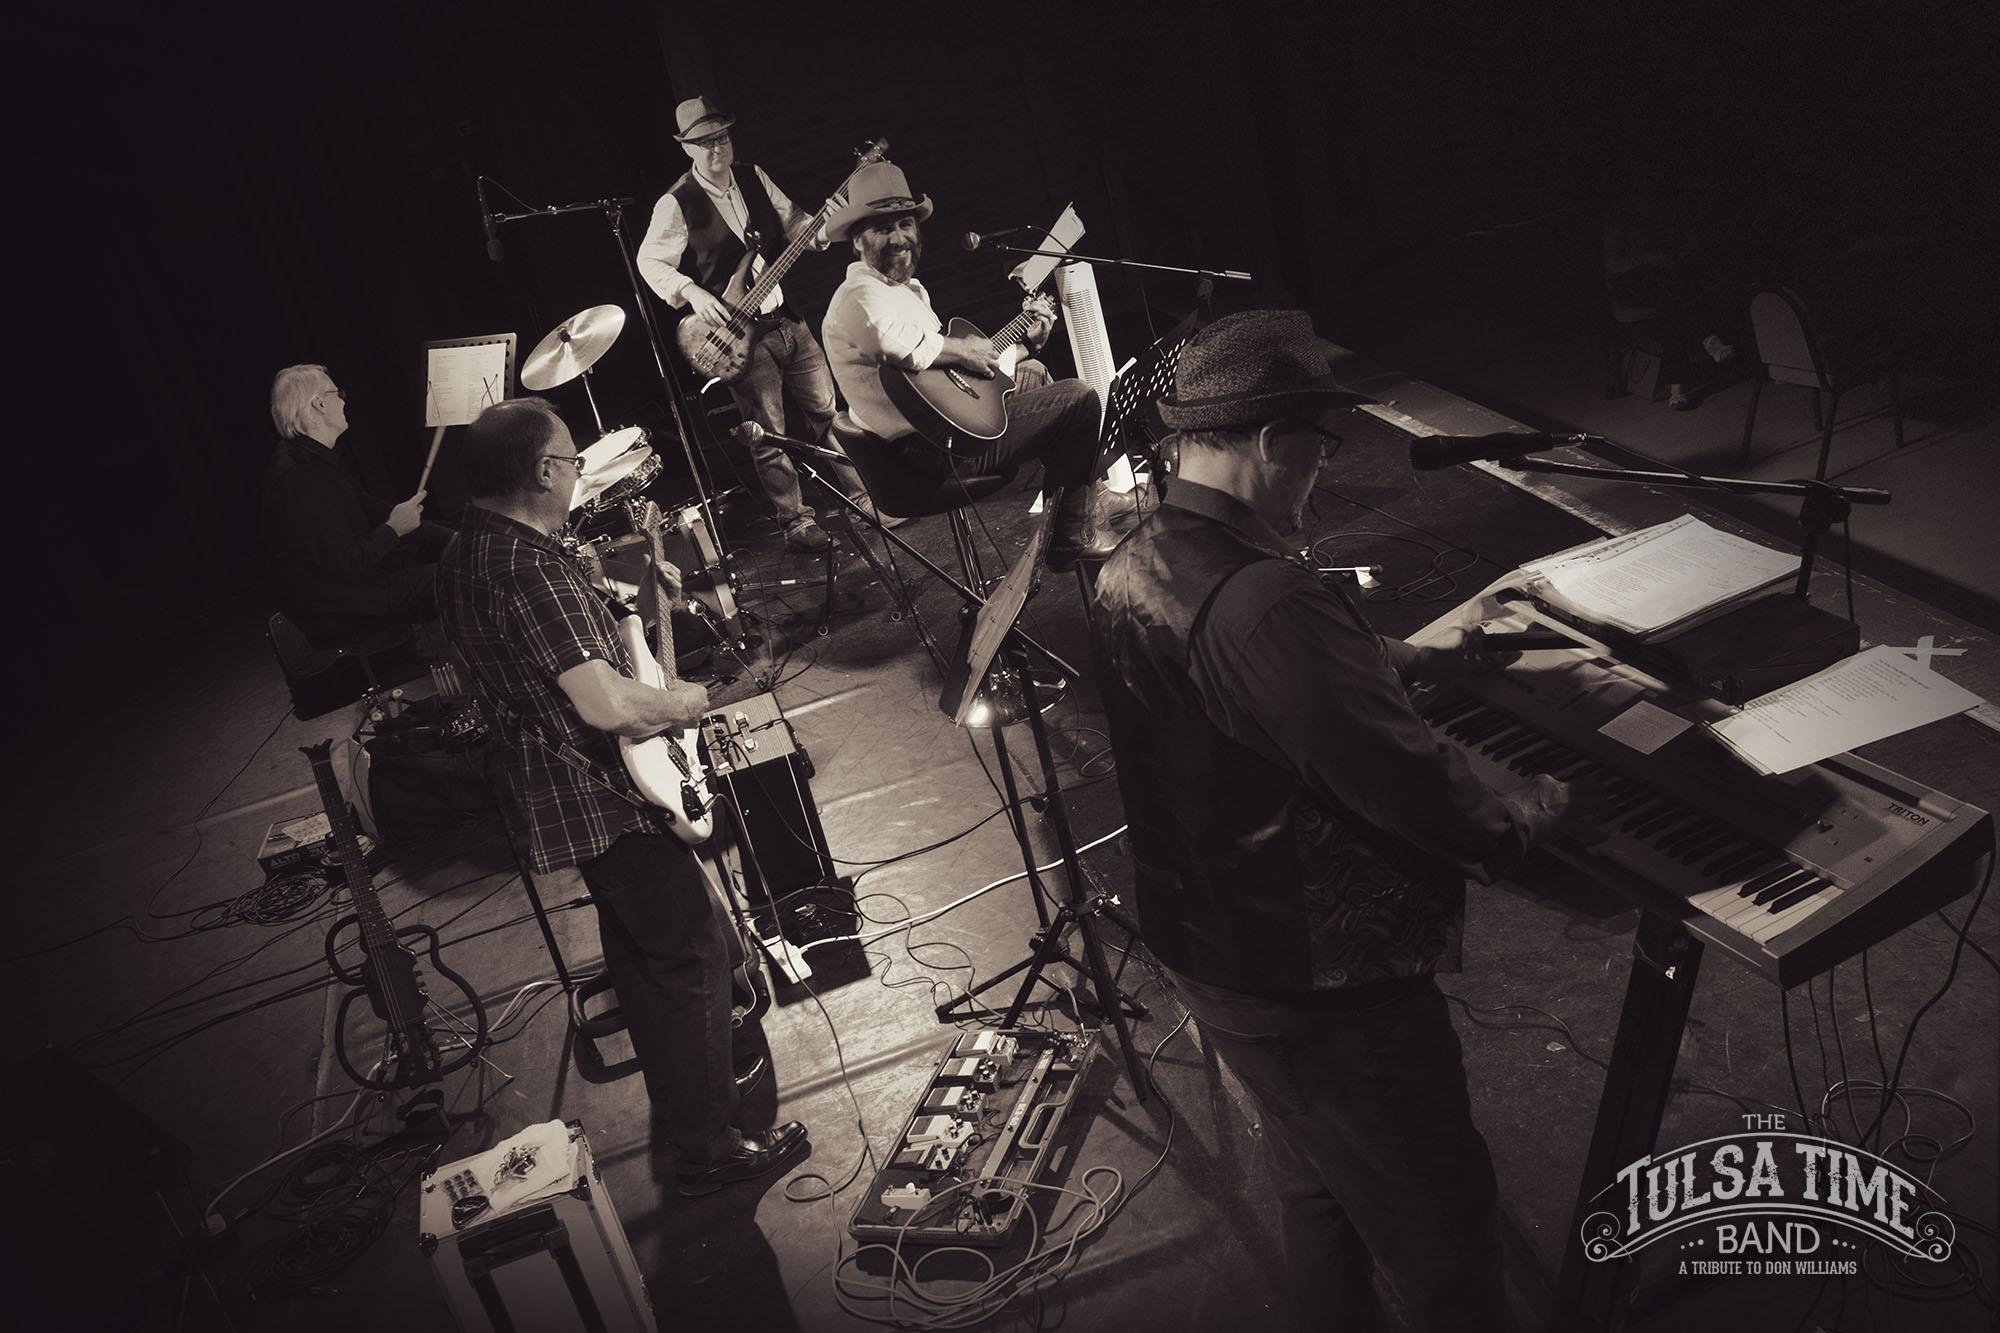 TulsaTimeBand©2017-WEB-FD0618-Band-002m.jpg